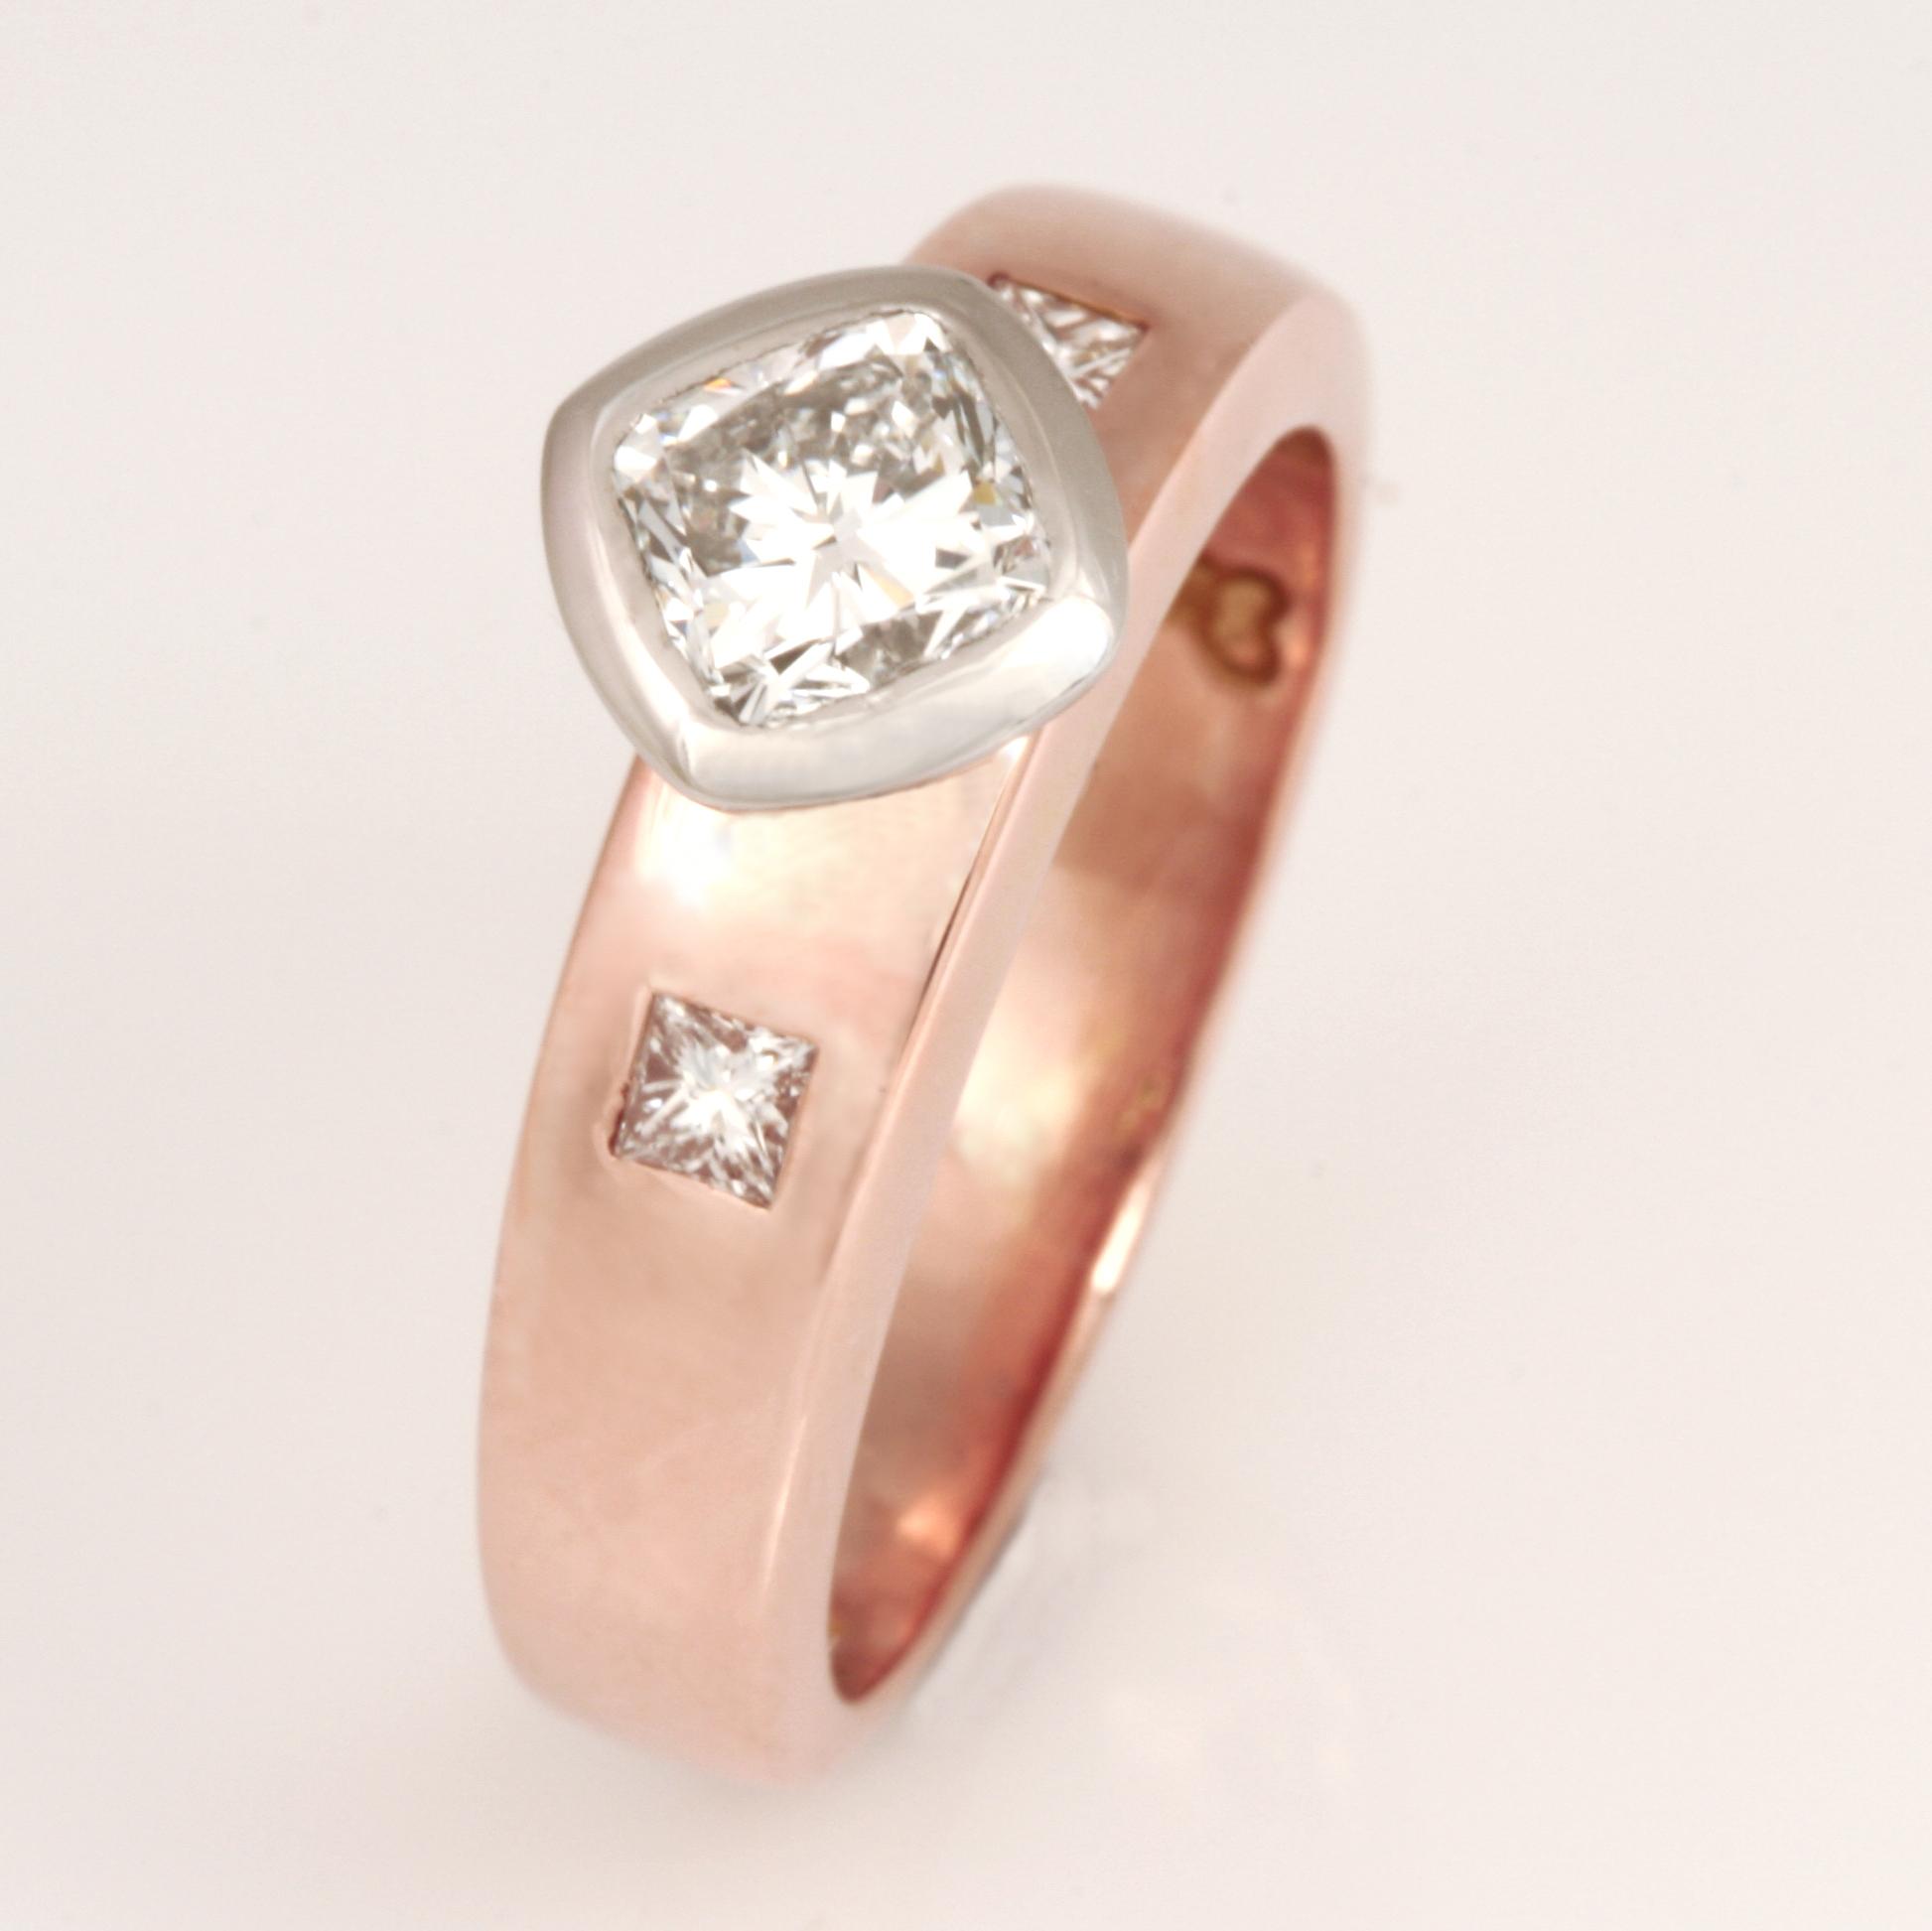 Handmade ladies 18ct rose gold and palladium cushion cut diamond engagement ring